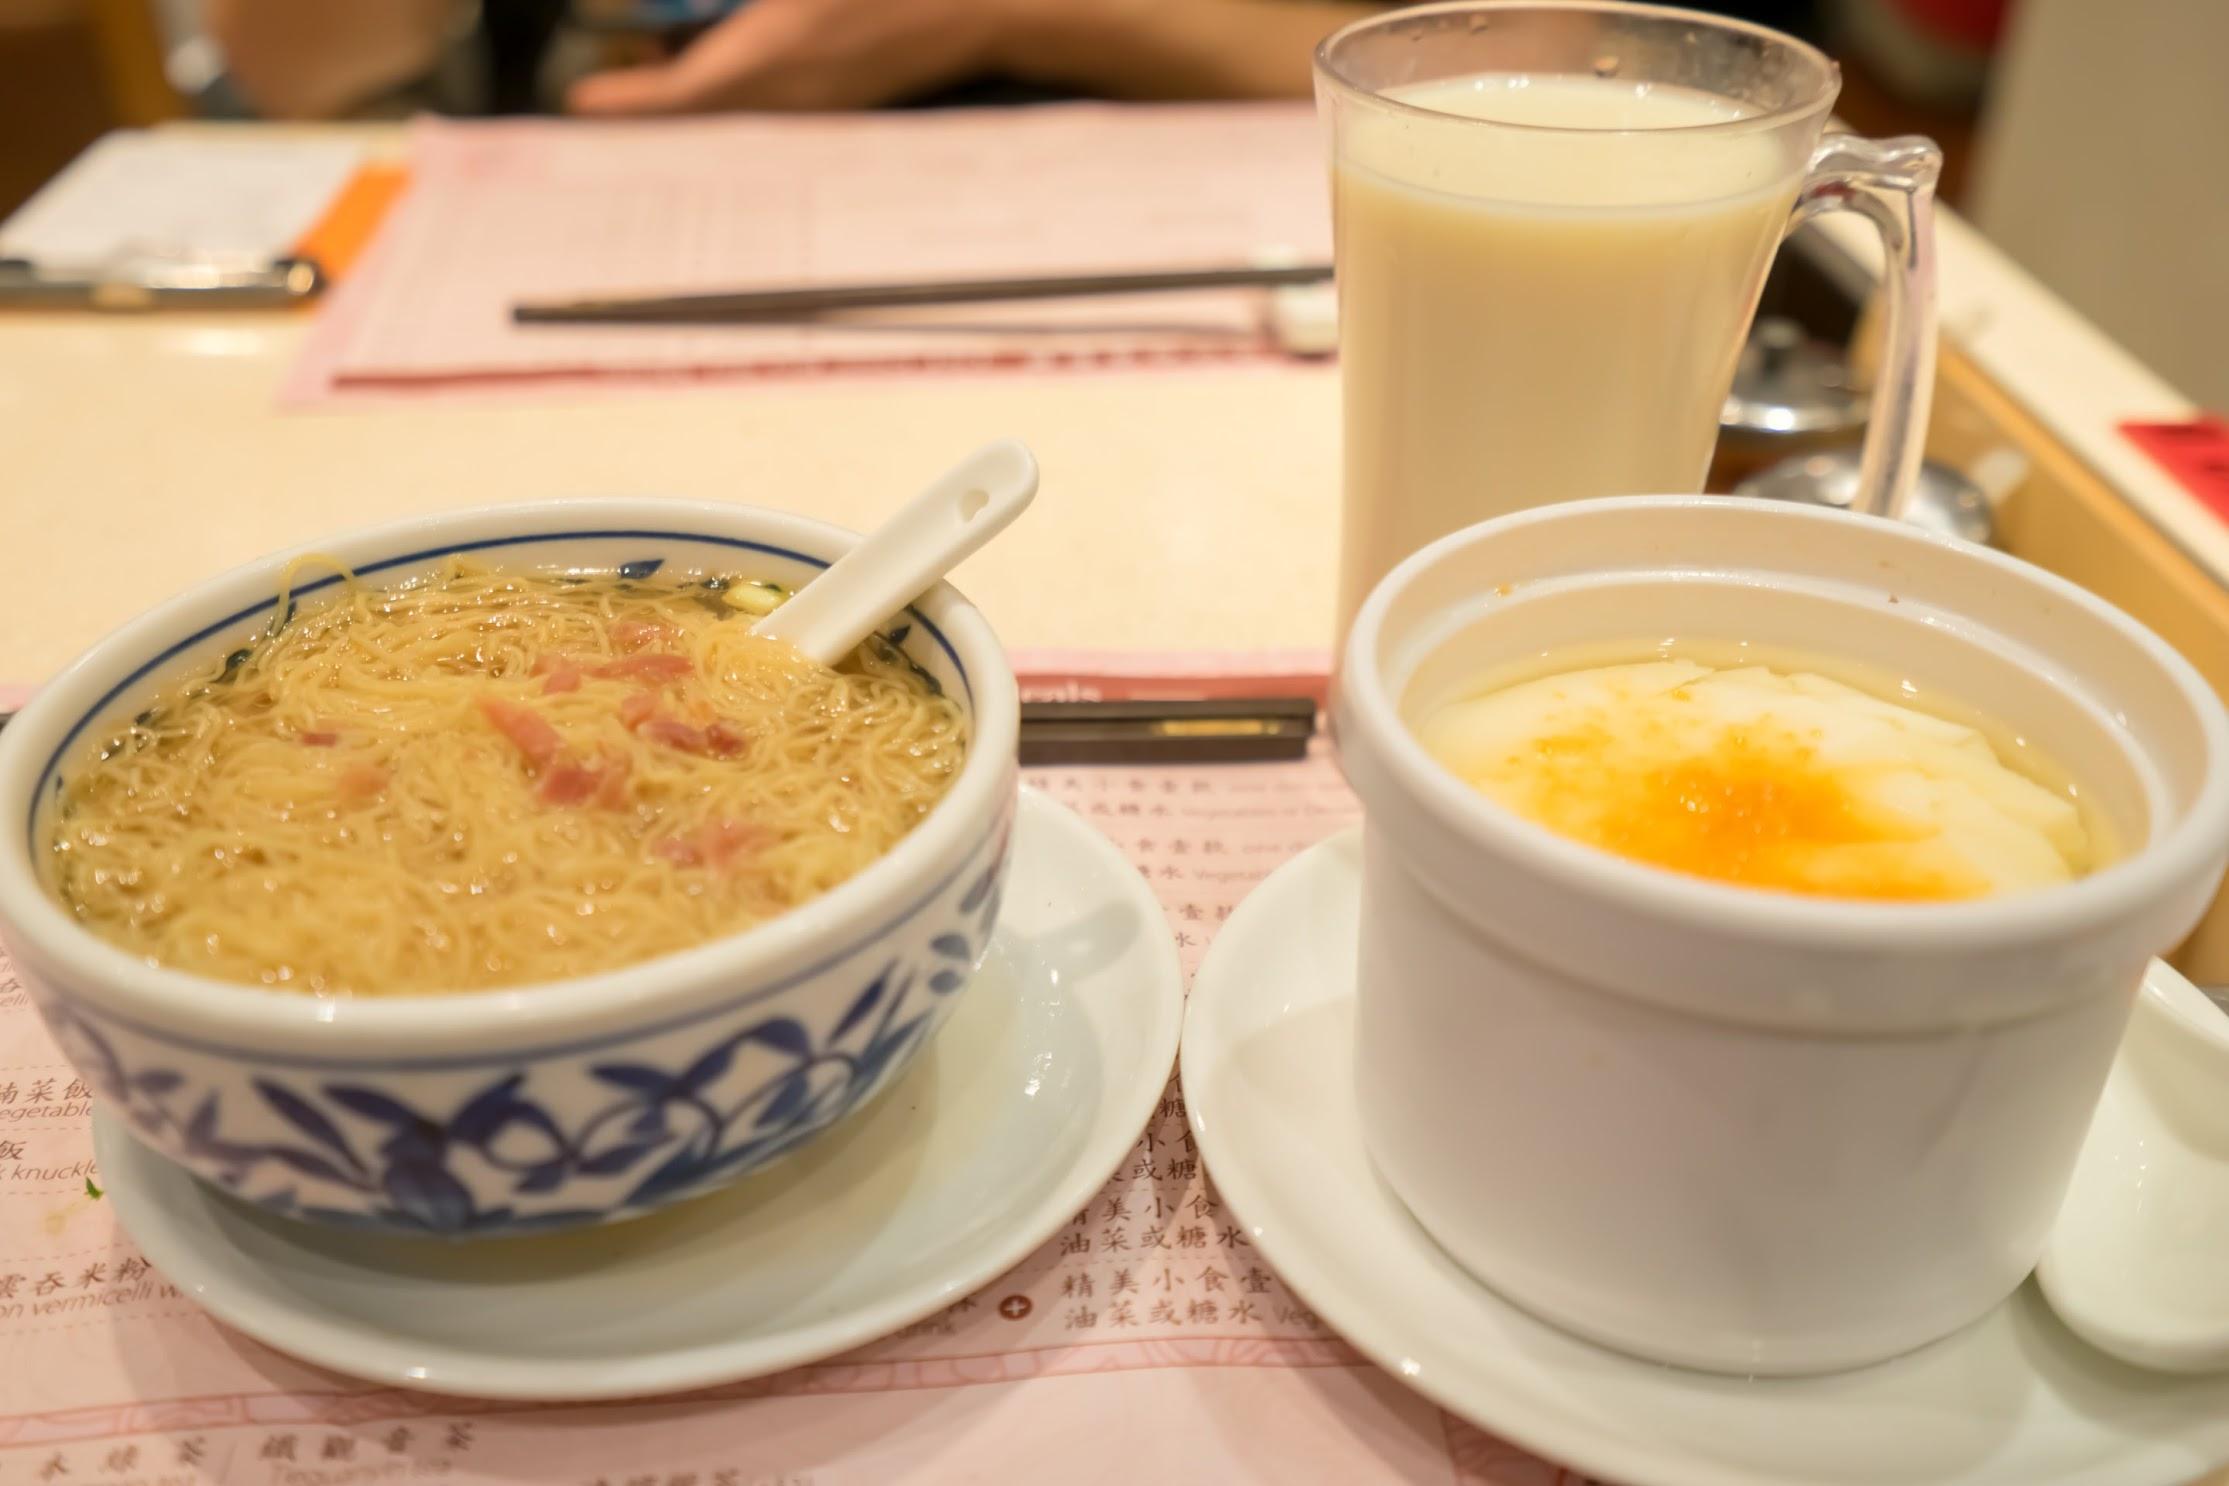 Hong Kong Chee Kei wonton noodle